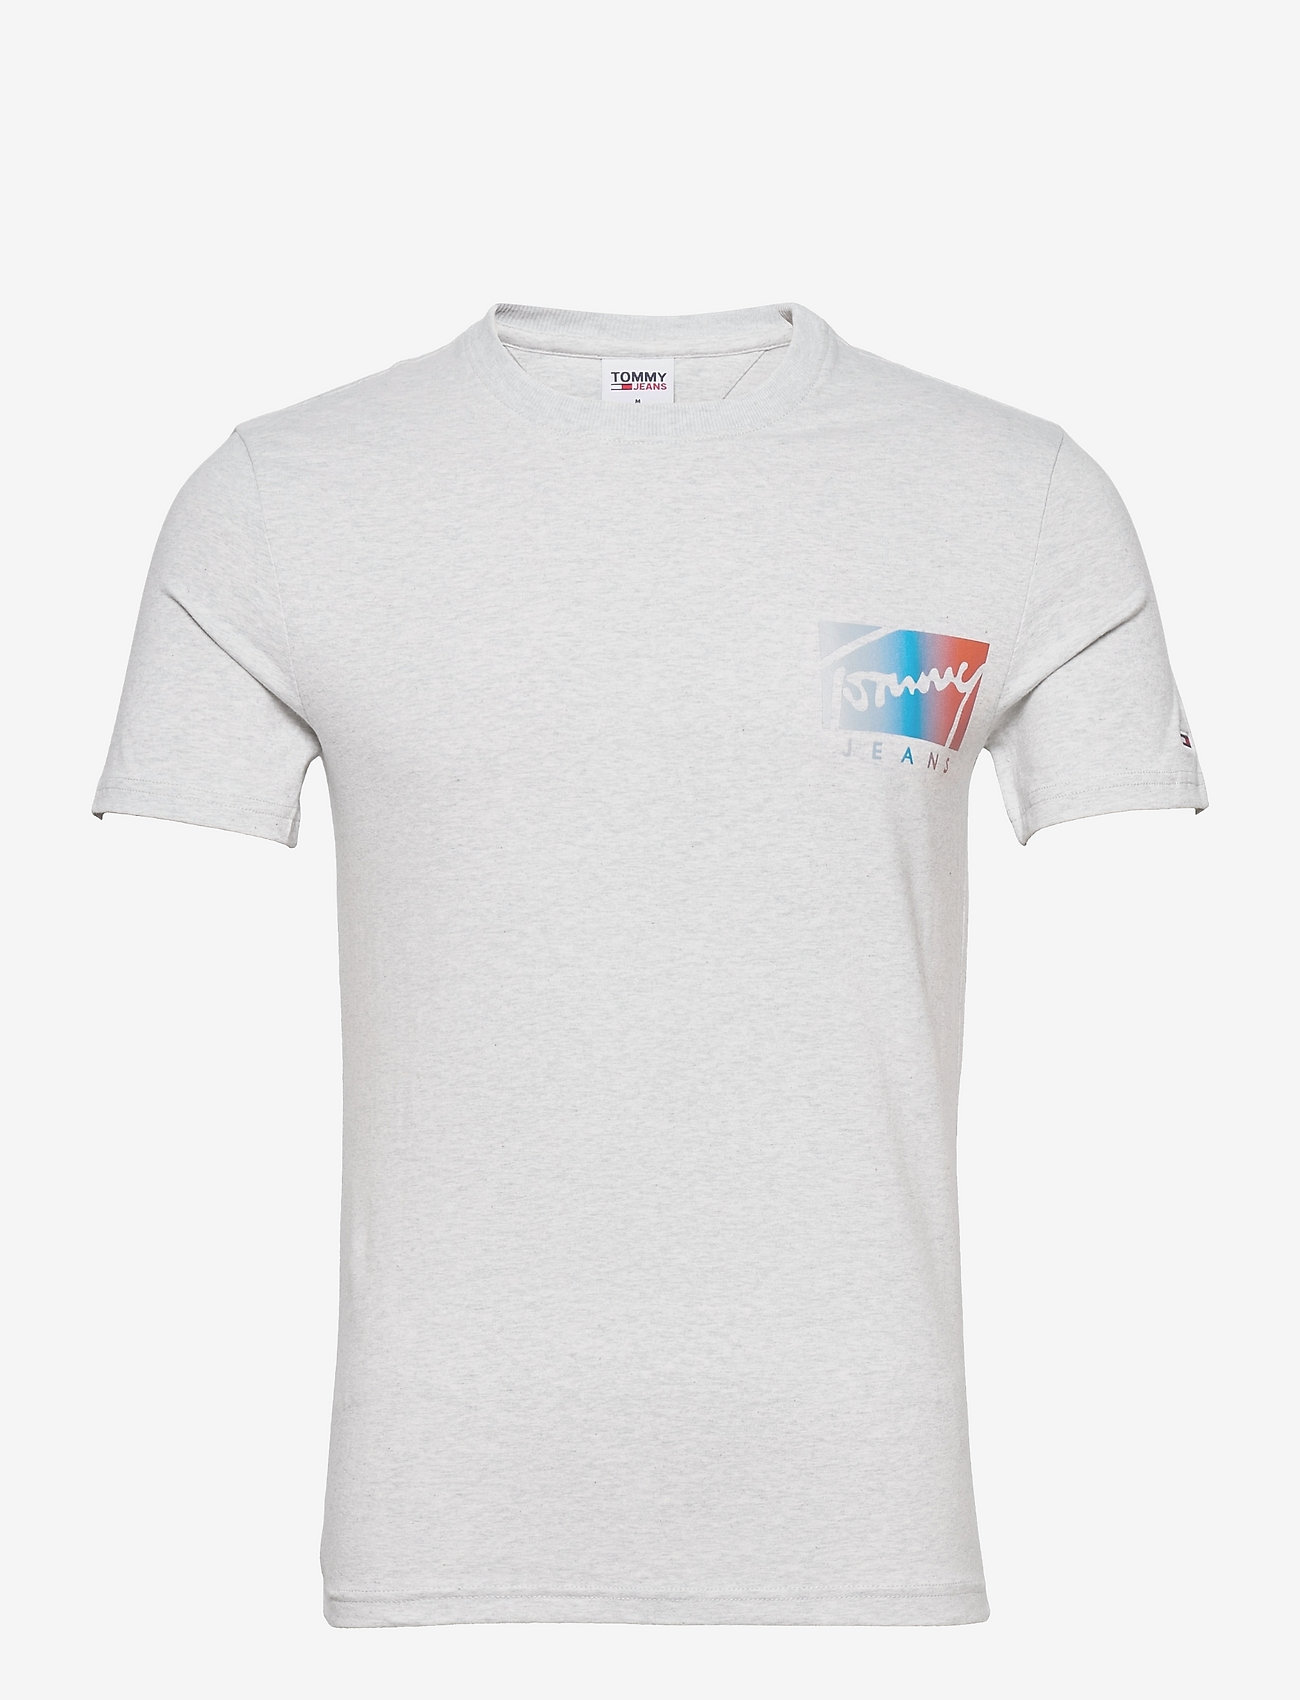 Tommy Jeans - TJM SCRIPT BOX LOGO TEE - kortärmade t-shirts - silver grey htr - 0